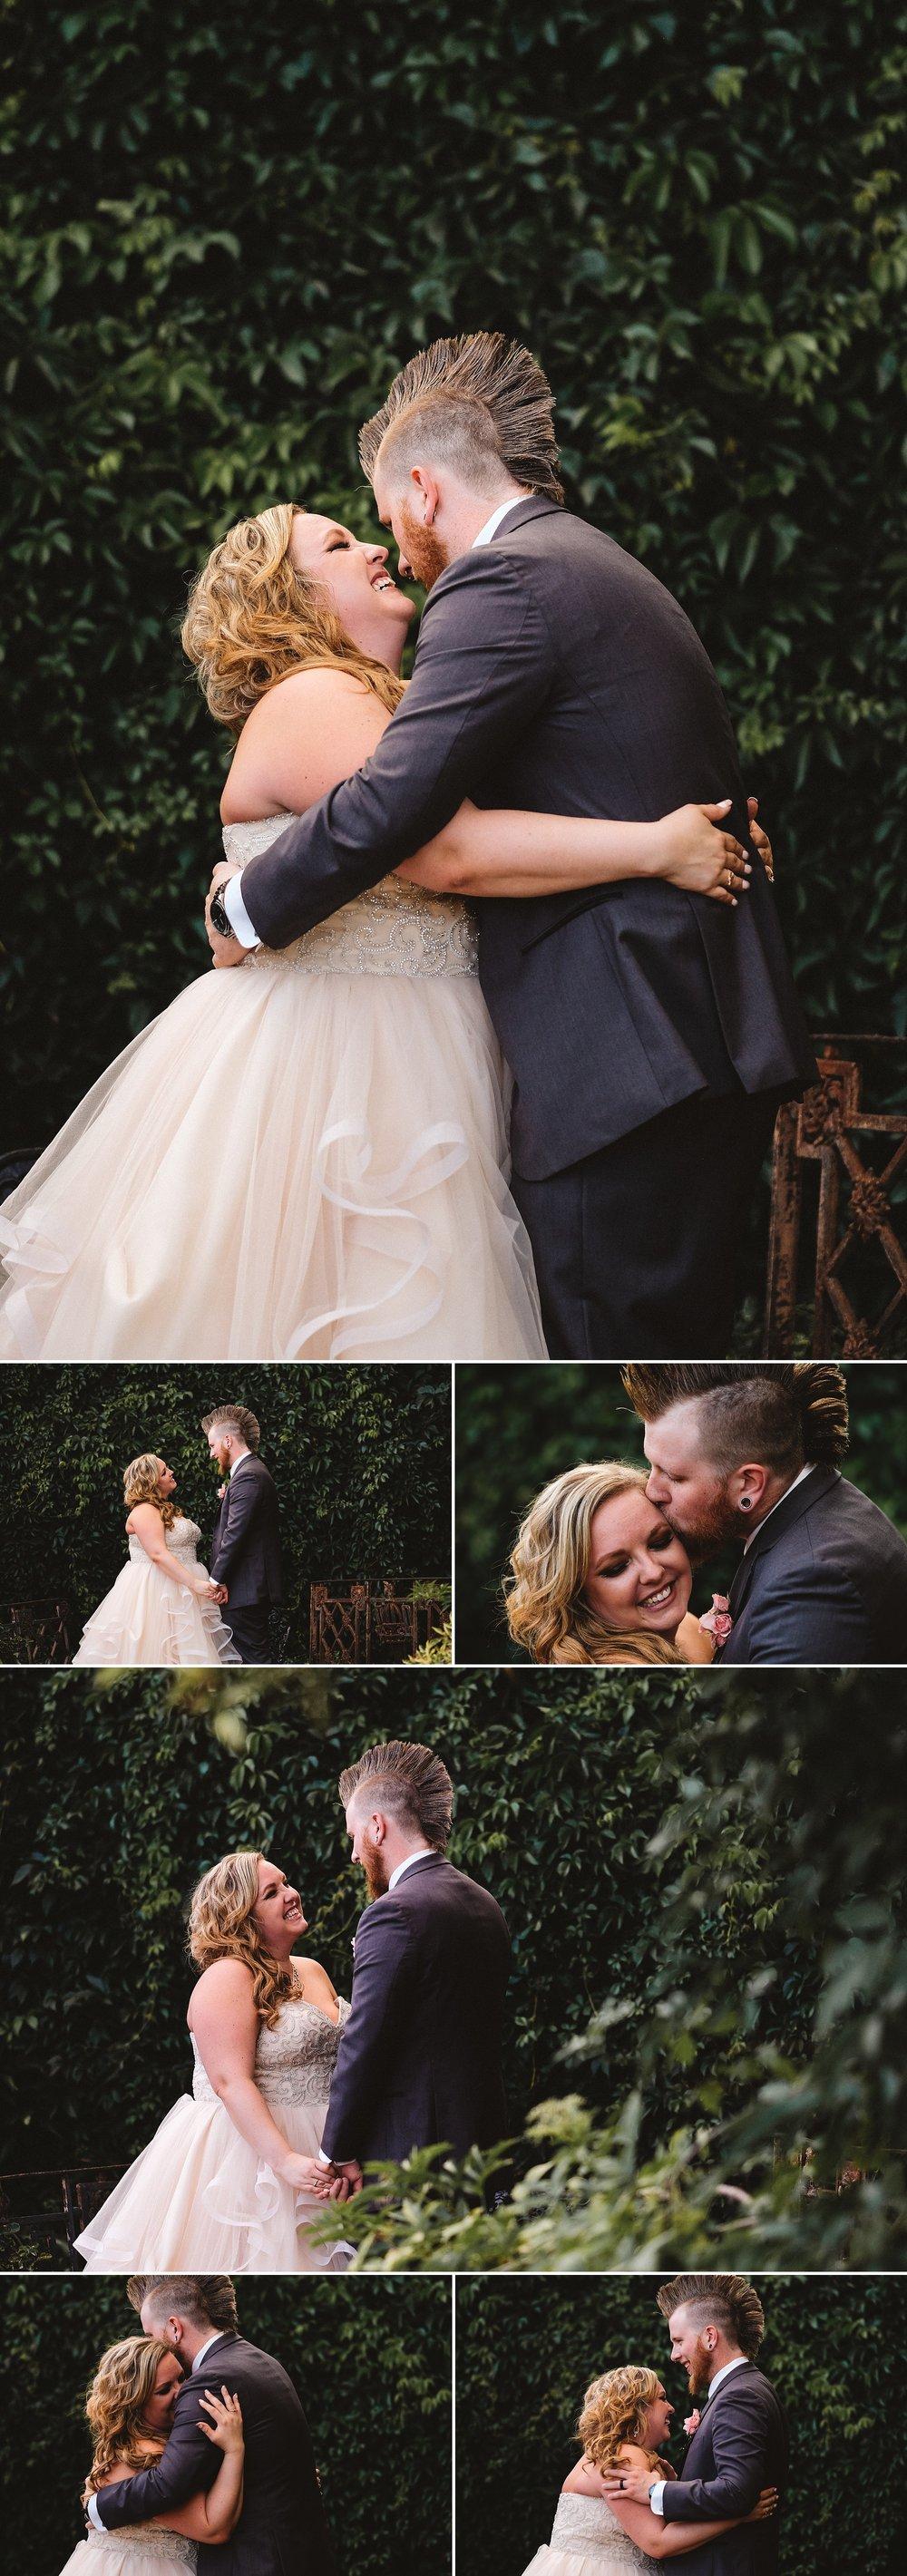 Mallory+Jake-Lionsgate-Event-Center-Wedding-Gatehouse-004_WEB.jpg